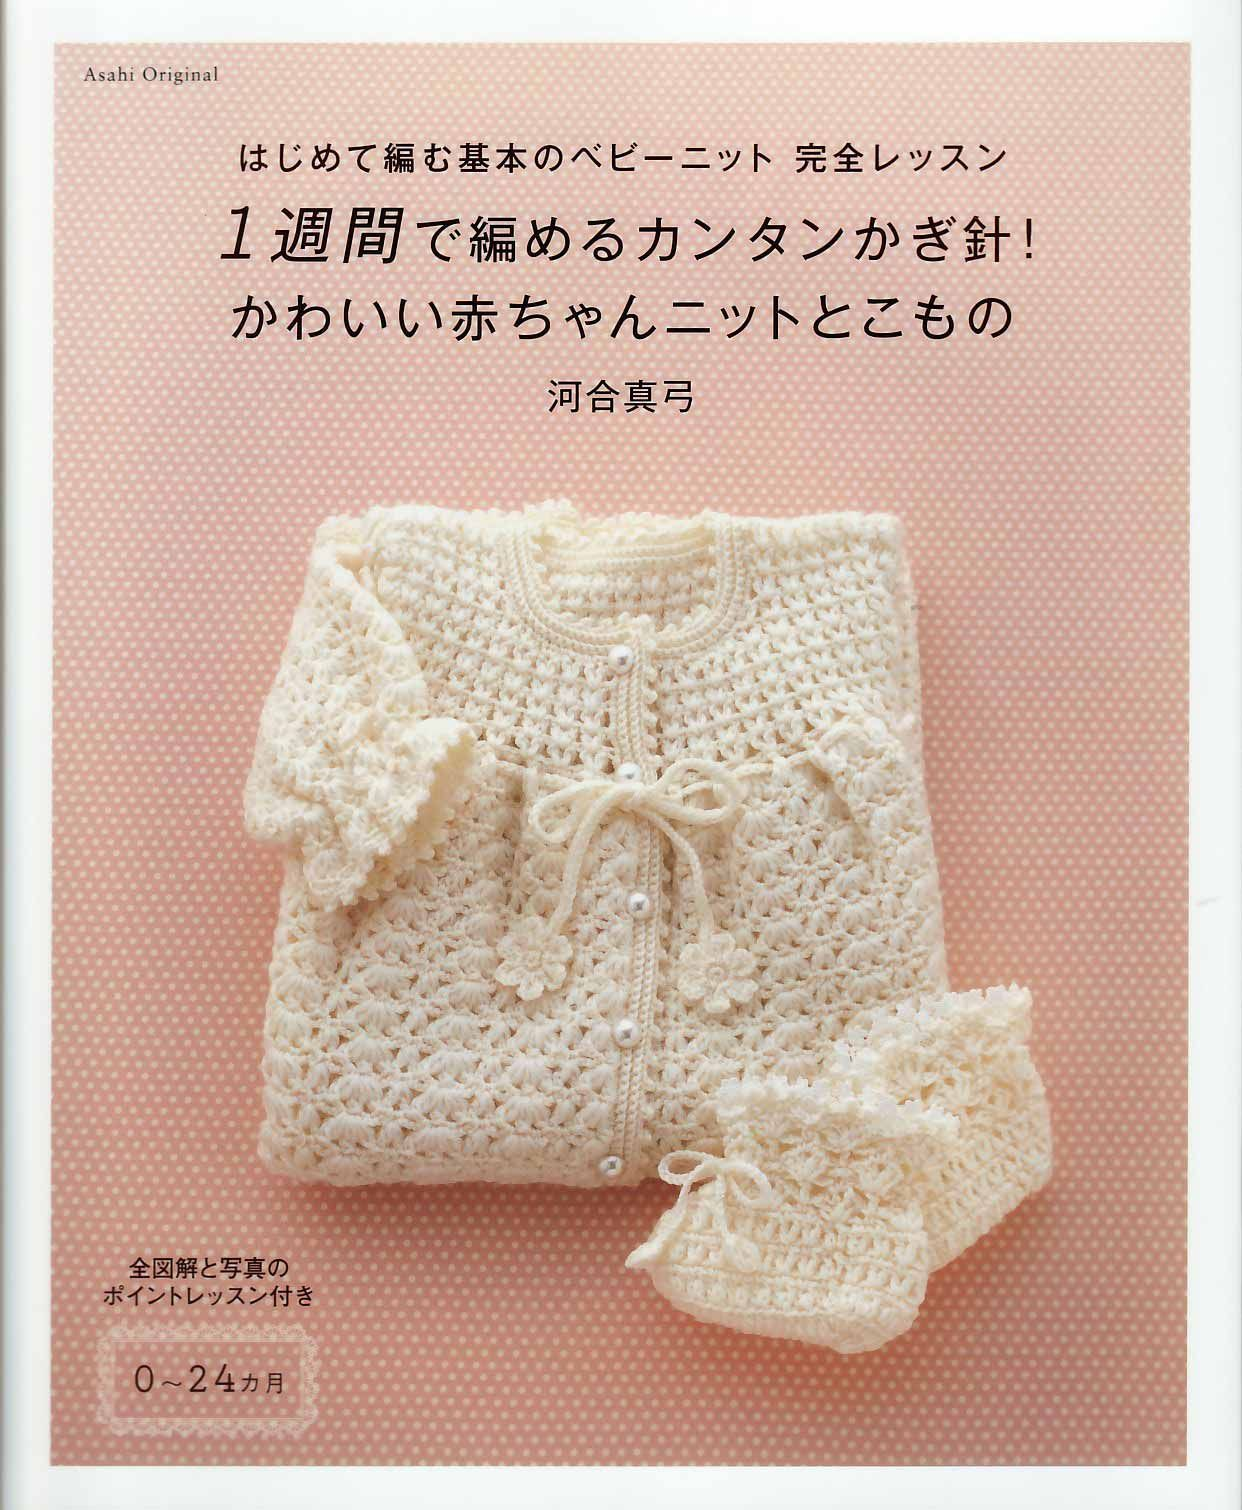 Asahi Original